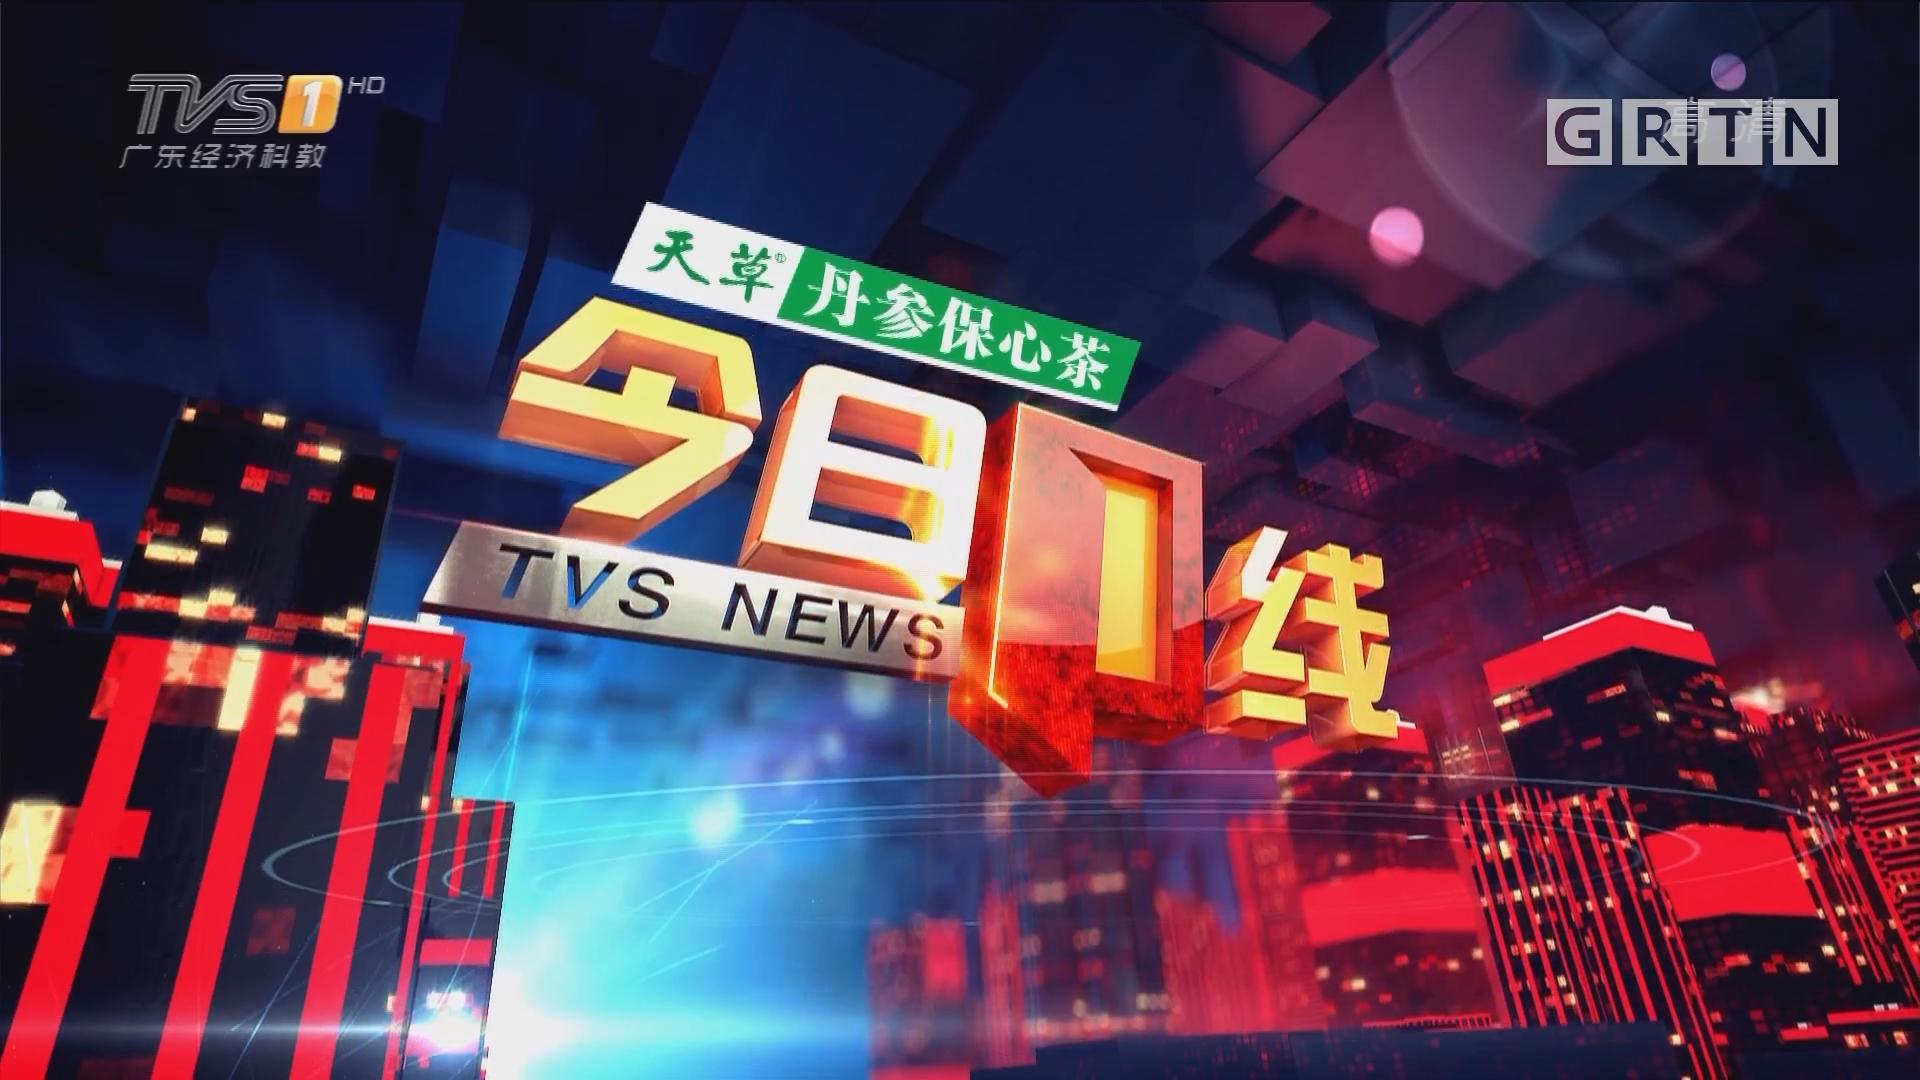 [HD][2018-05-02]今日一线:中山三乡:男子持刀闯餐厅 被顾客联手制服